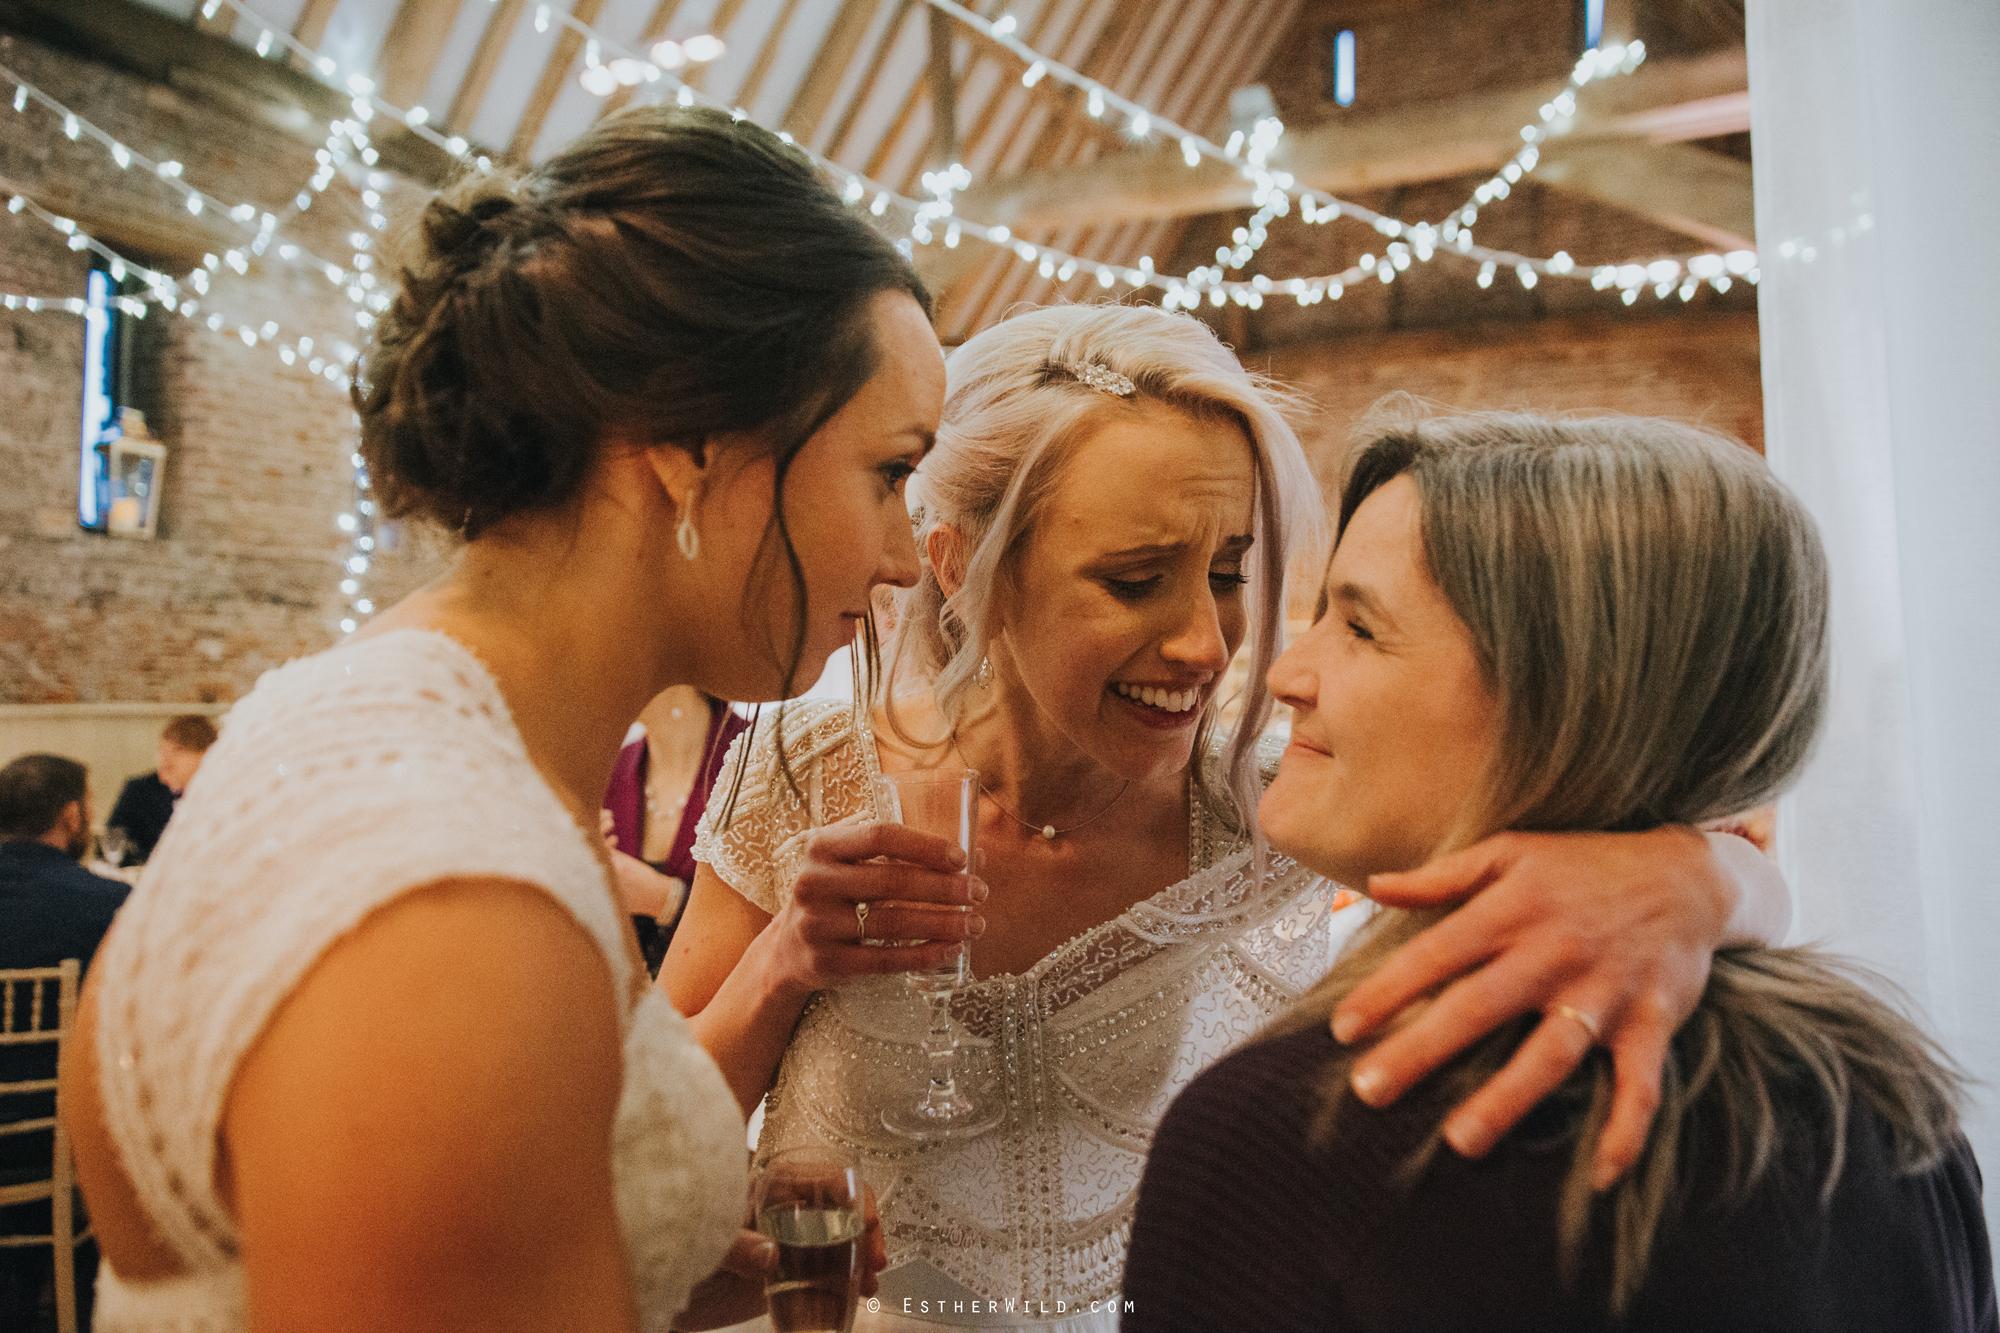 Elms_Barn_Weddings_Suffolk_Photographer_Copyright_Esther_Wild_IMG_2384.jpg